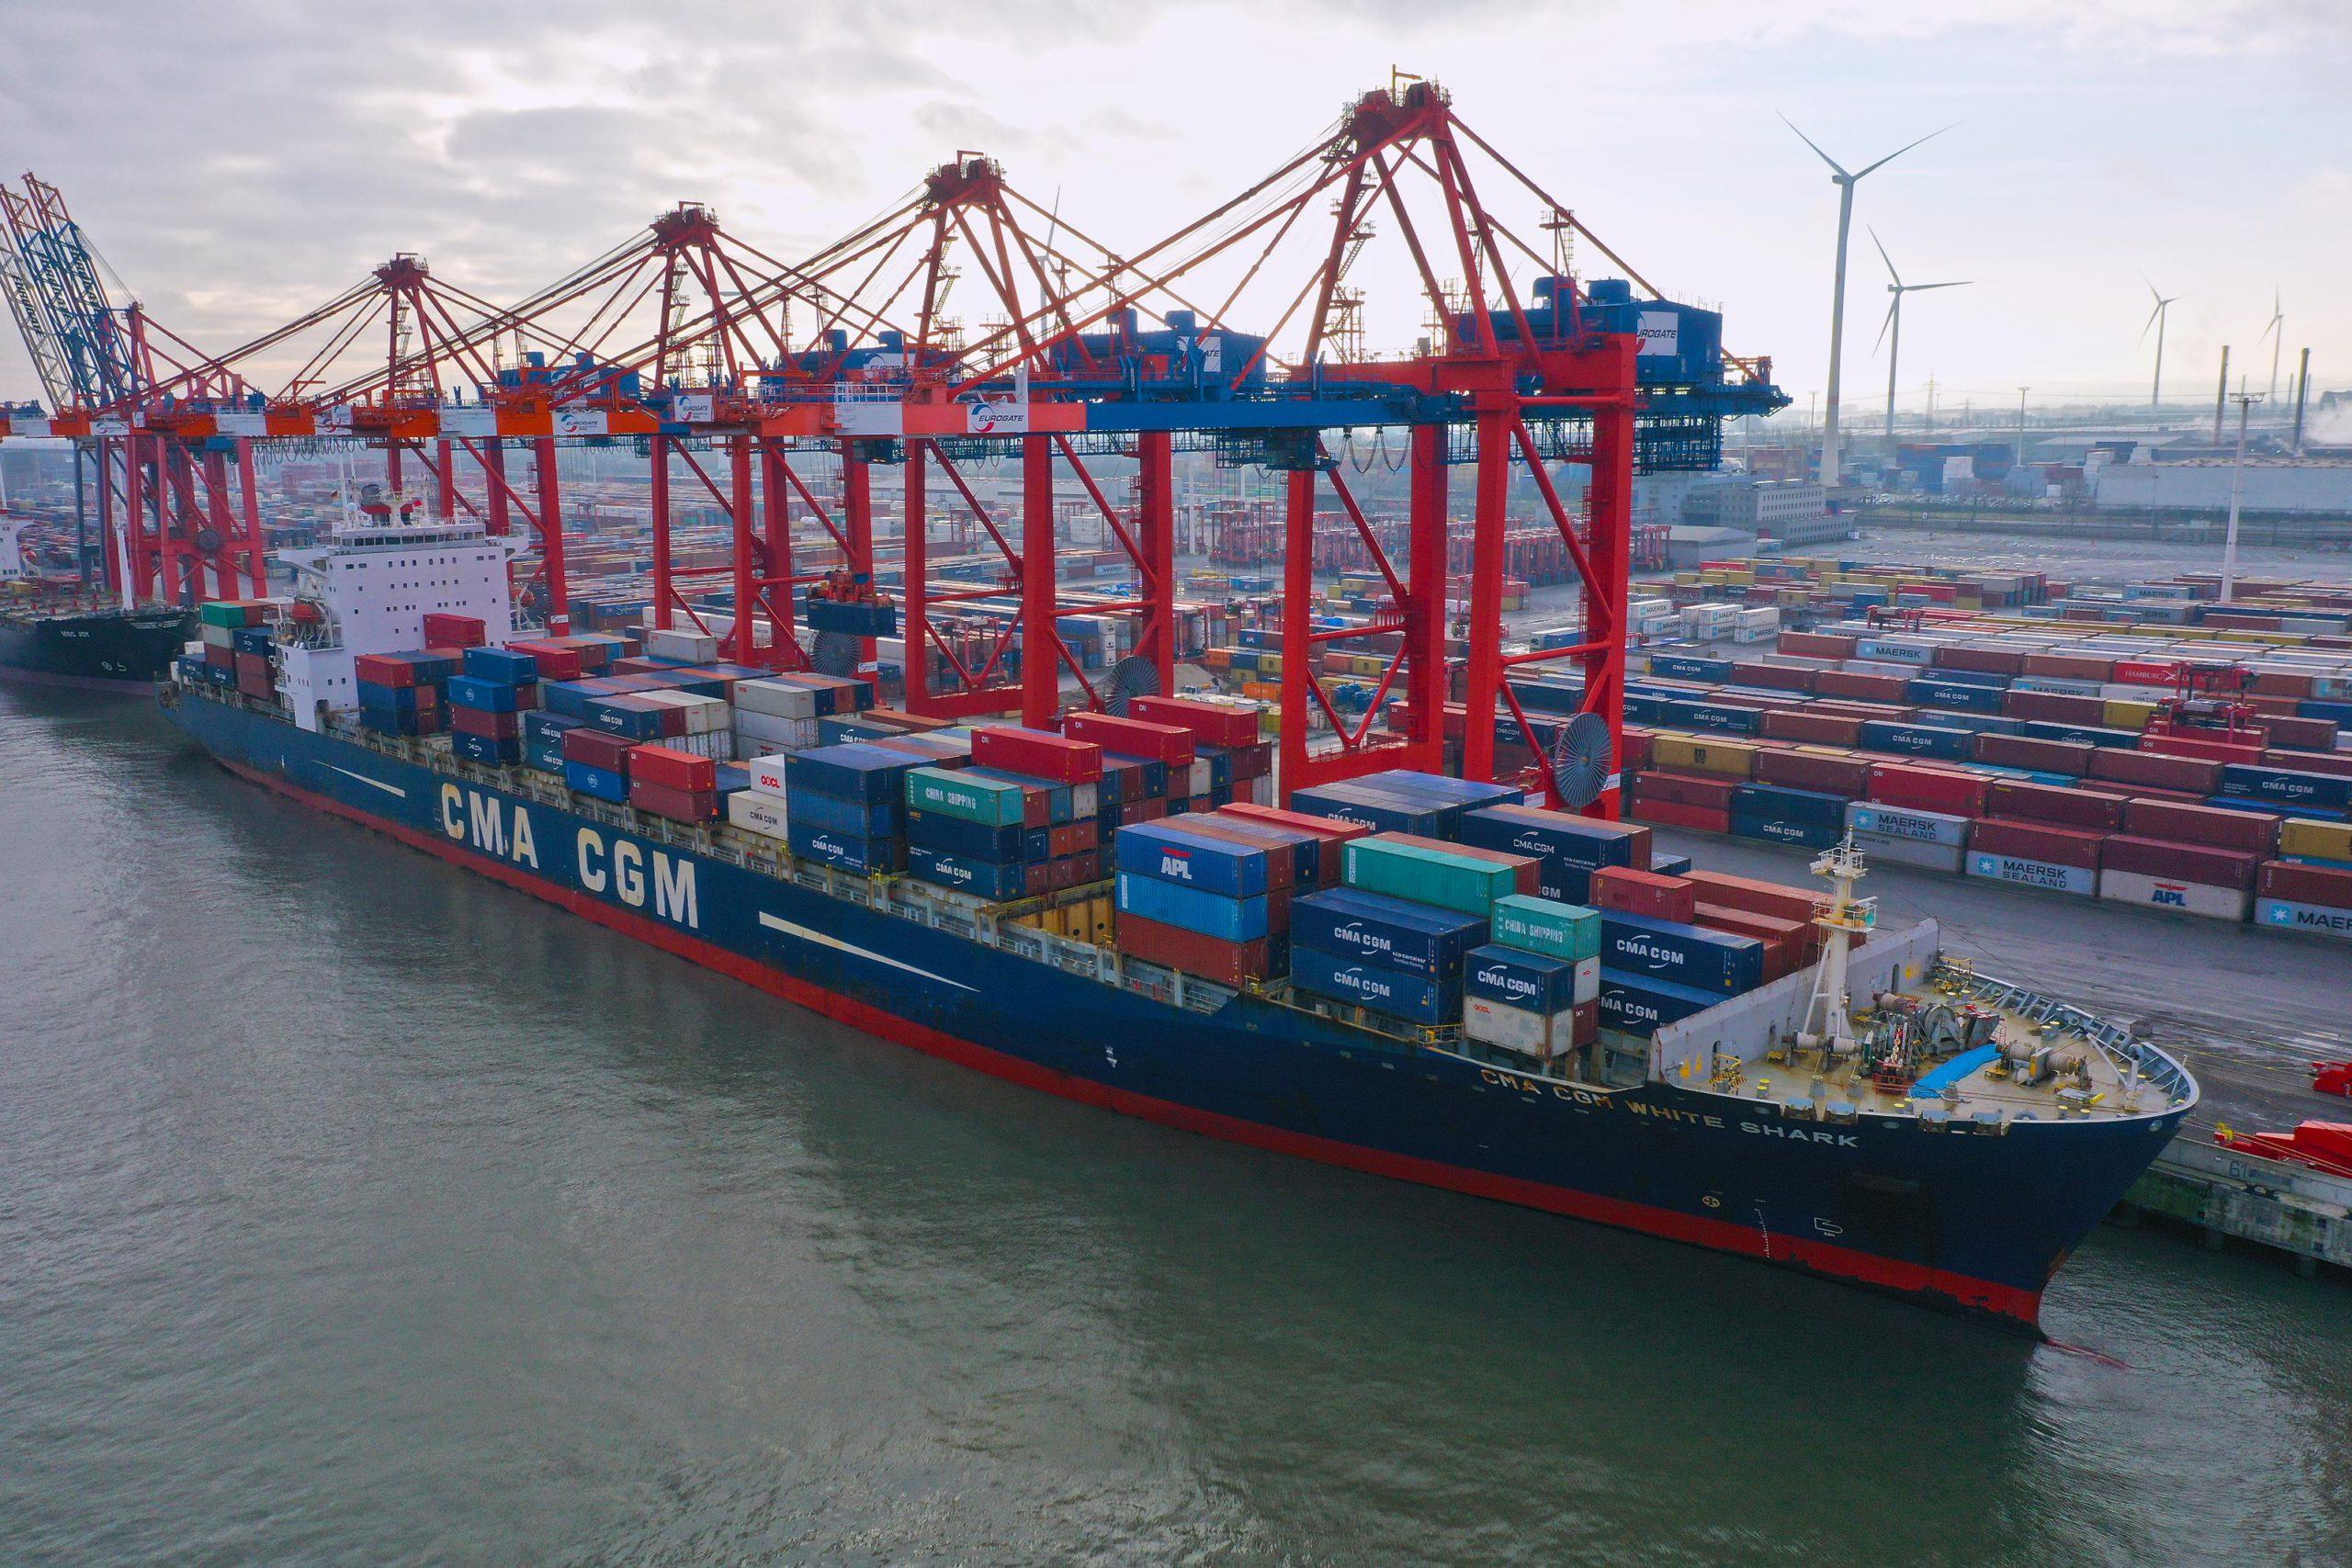 CMA CGM service connects Port of Hamburg to Turkish ports